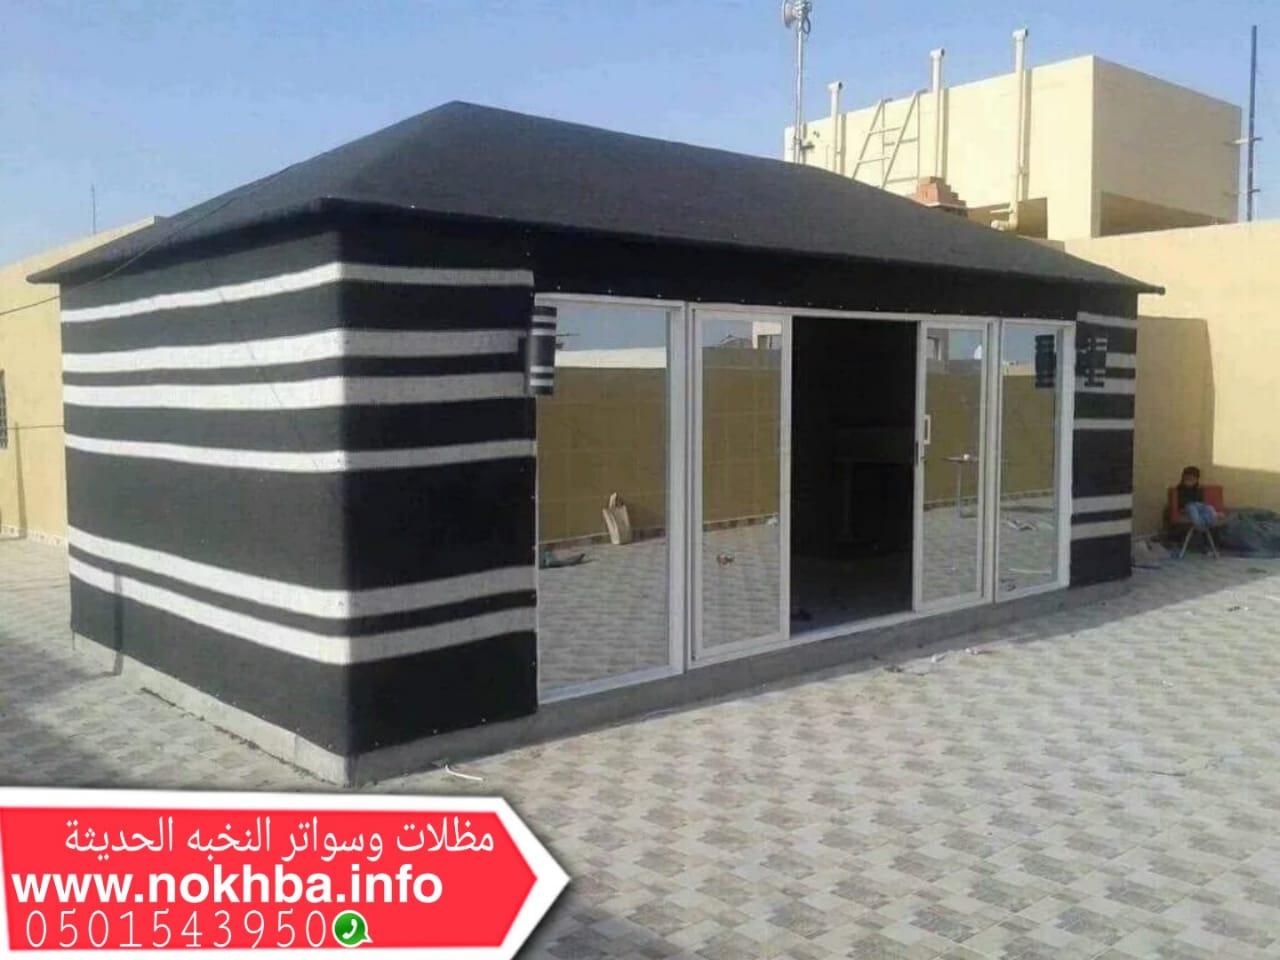 بيوت شعر الرياض , 0501543950 , صور تصاميم بيوت شعر  , تصاميم خيام و بيوت شعر ملكيه , P_1643nvy9a4